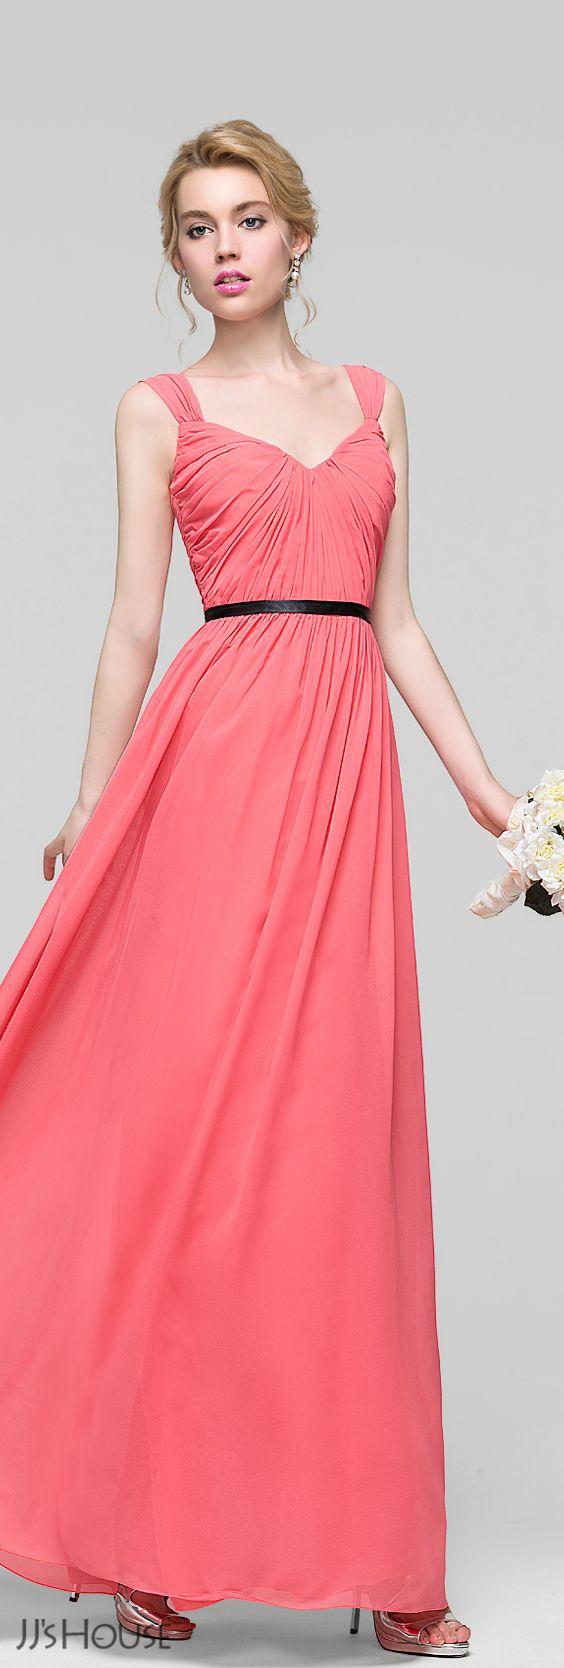 JJsHouse #Bridesmaid | JJsHouse Bridesmaid Dresses | Pinterest ...